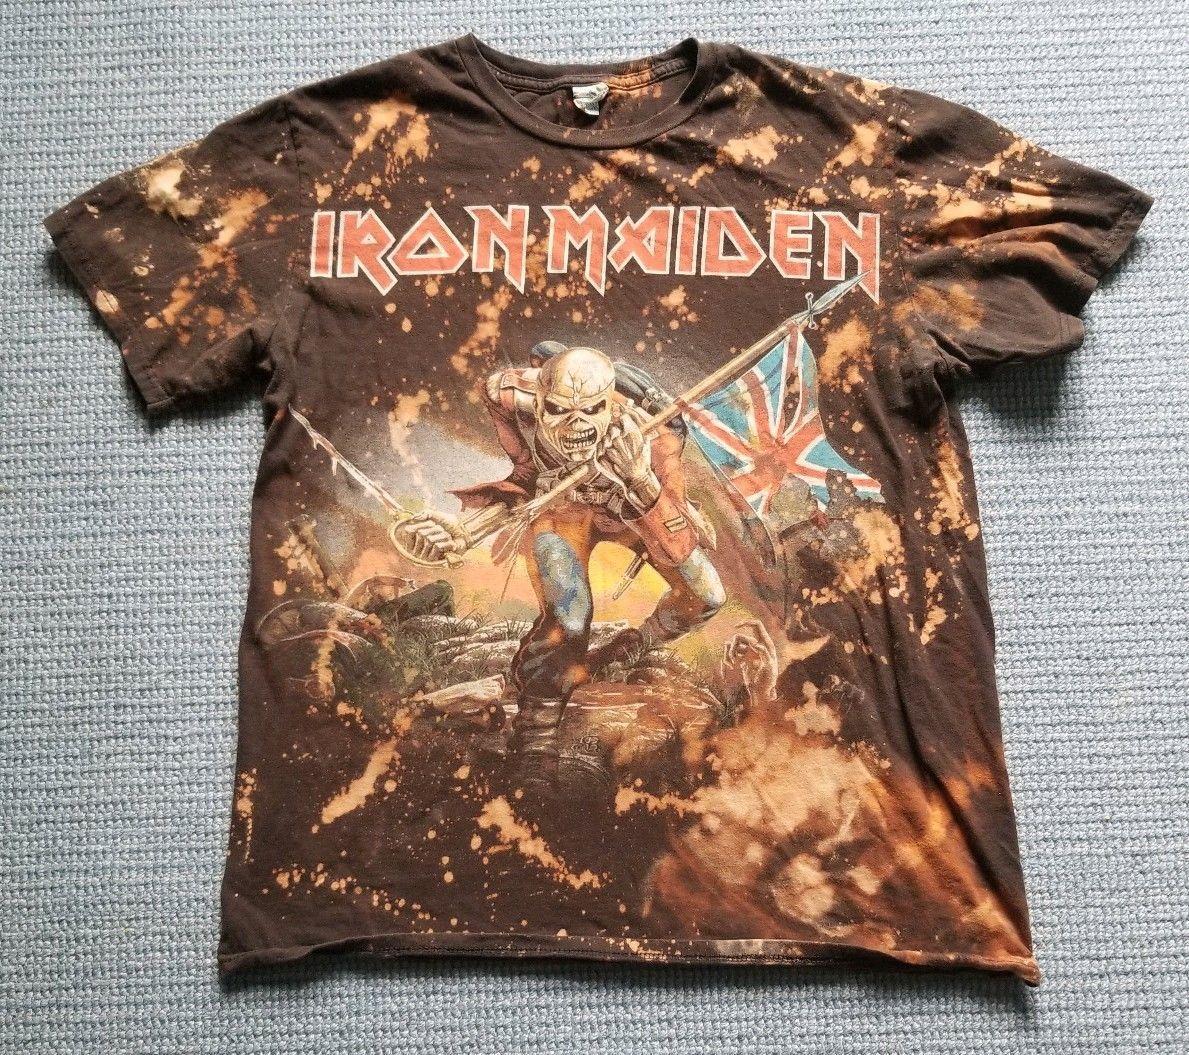 f4bd5492 Iron Maiden The Trooper Rock Band Tie Dye T-Shirt Size Large Black/Brown  Delta #IronMaiden #TheTrooper #Eddie #EddietheHead #TieDye #Metal #Rock # Band ...